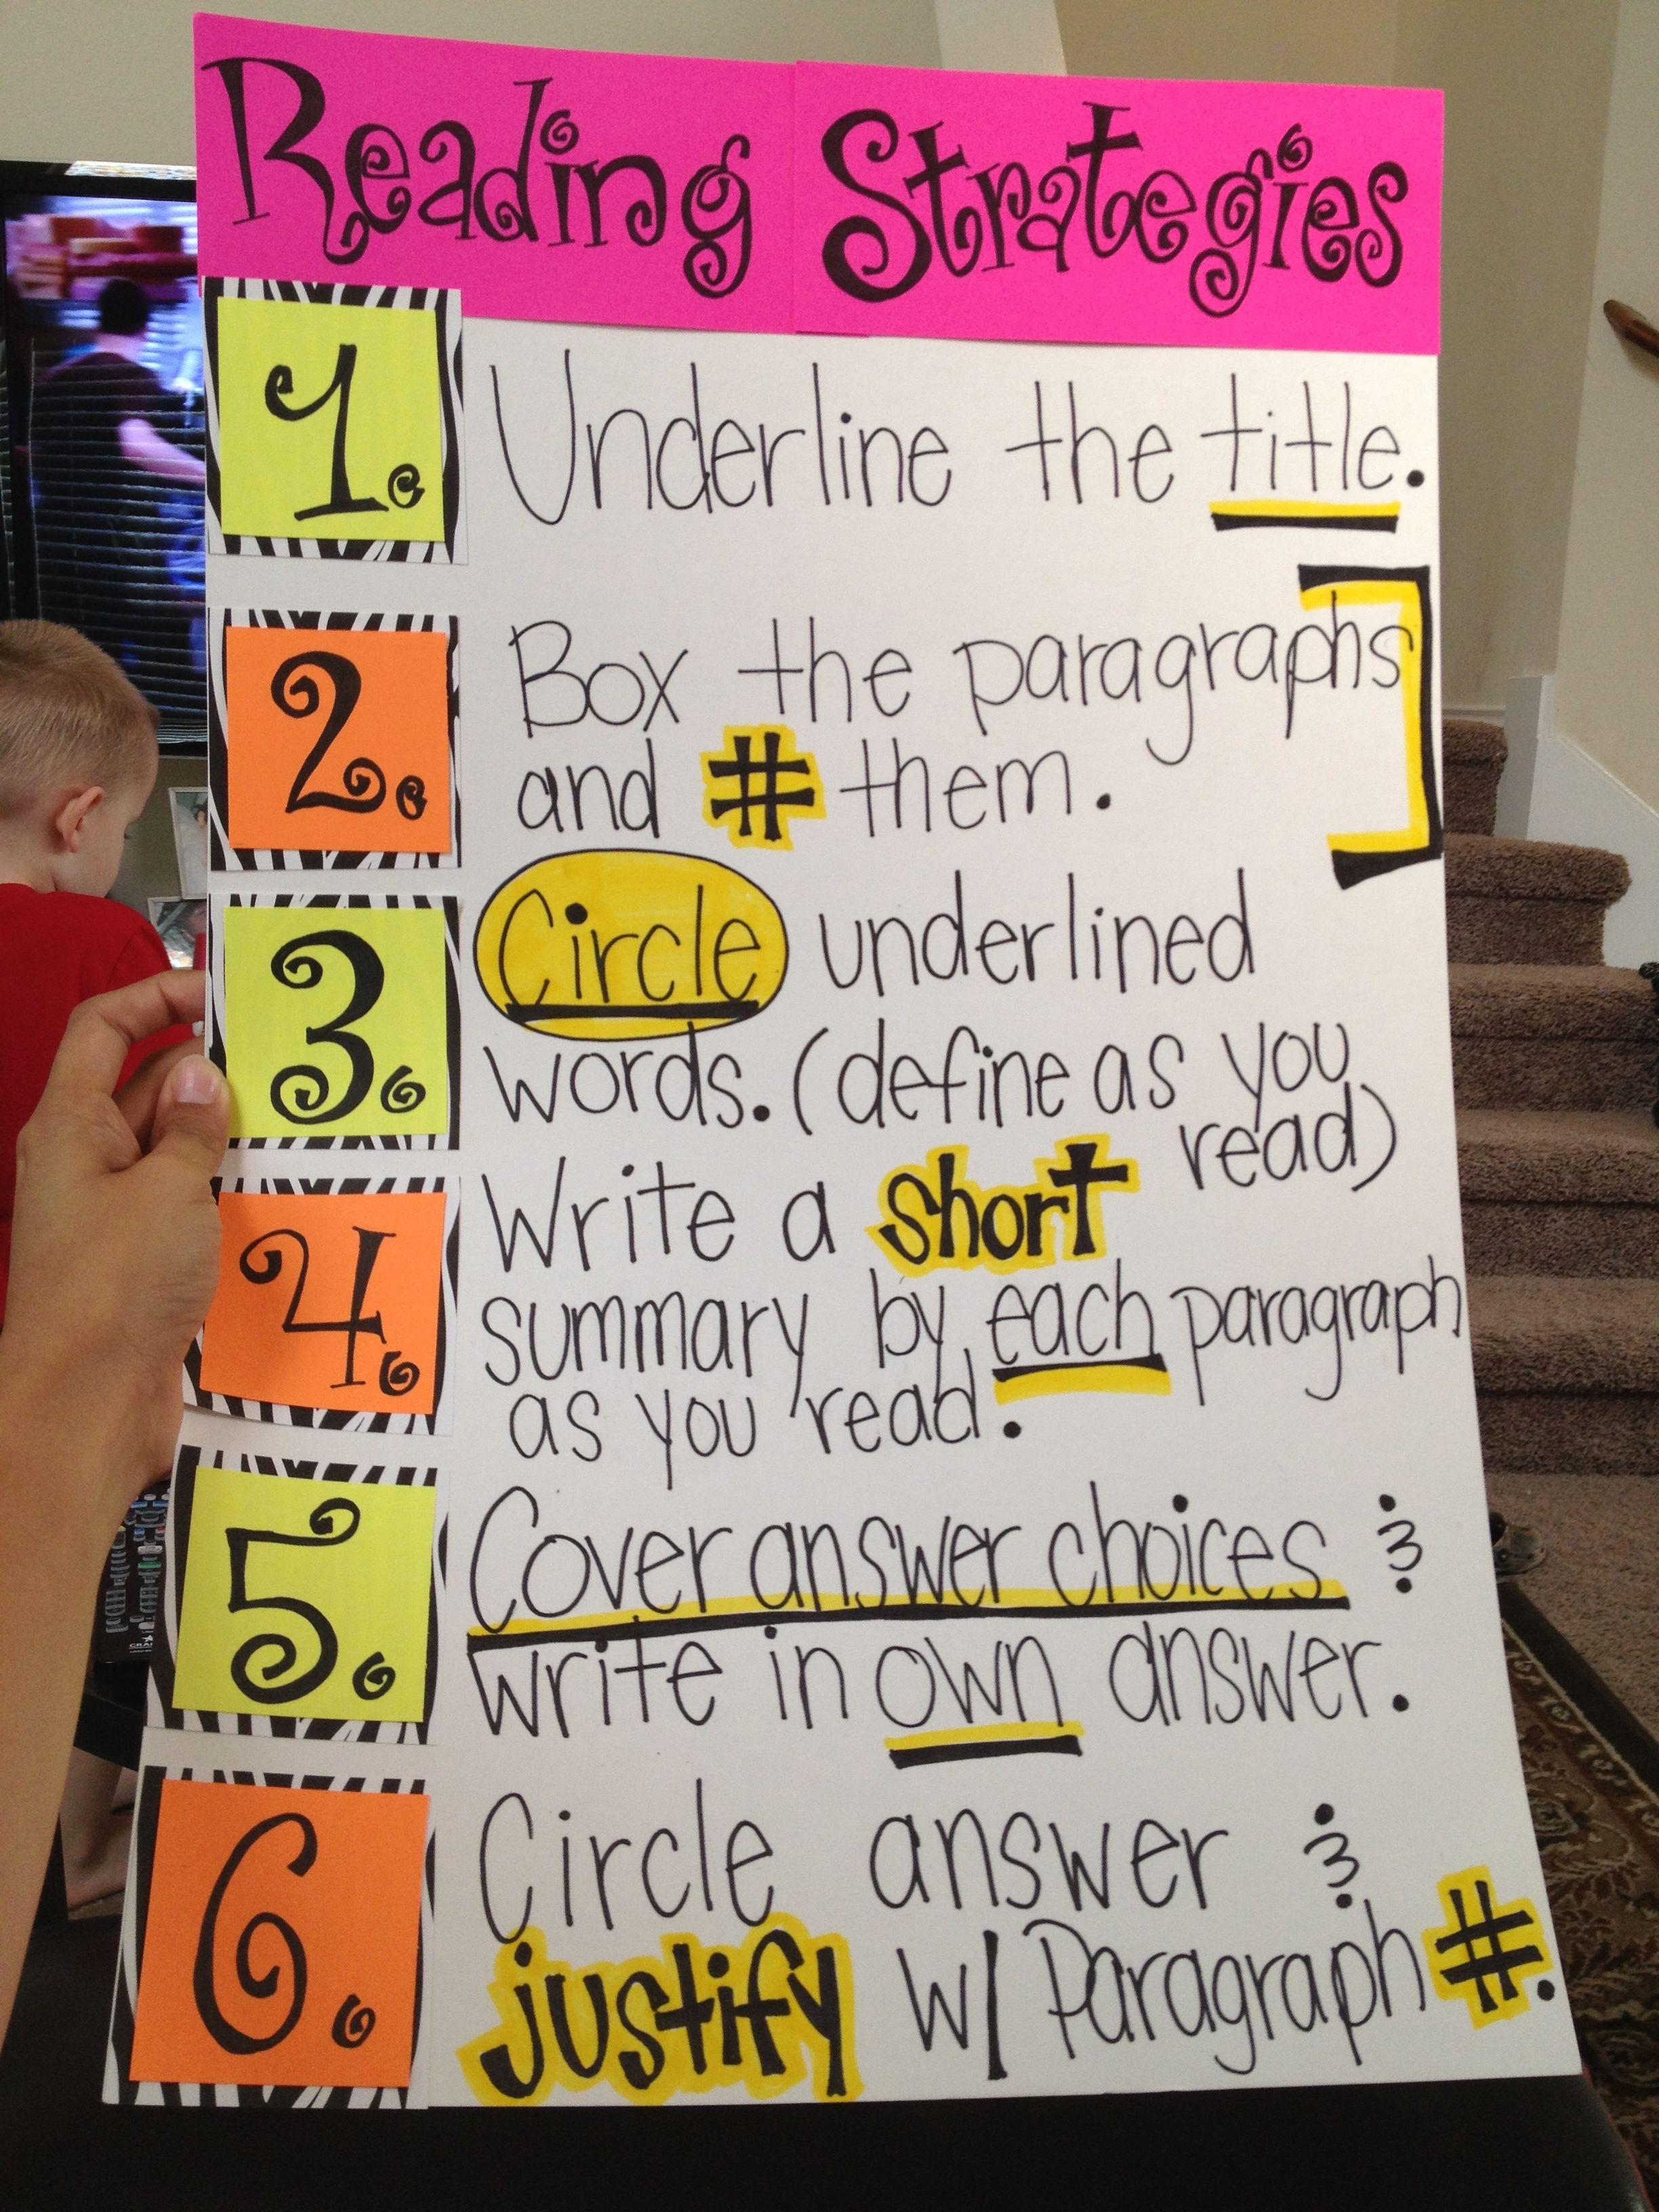 Staar Reading Strategies Staar Reading Staar Reading Strategies Reading Classroom [ 3264 x 2448 Pixel ]